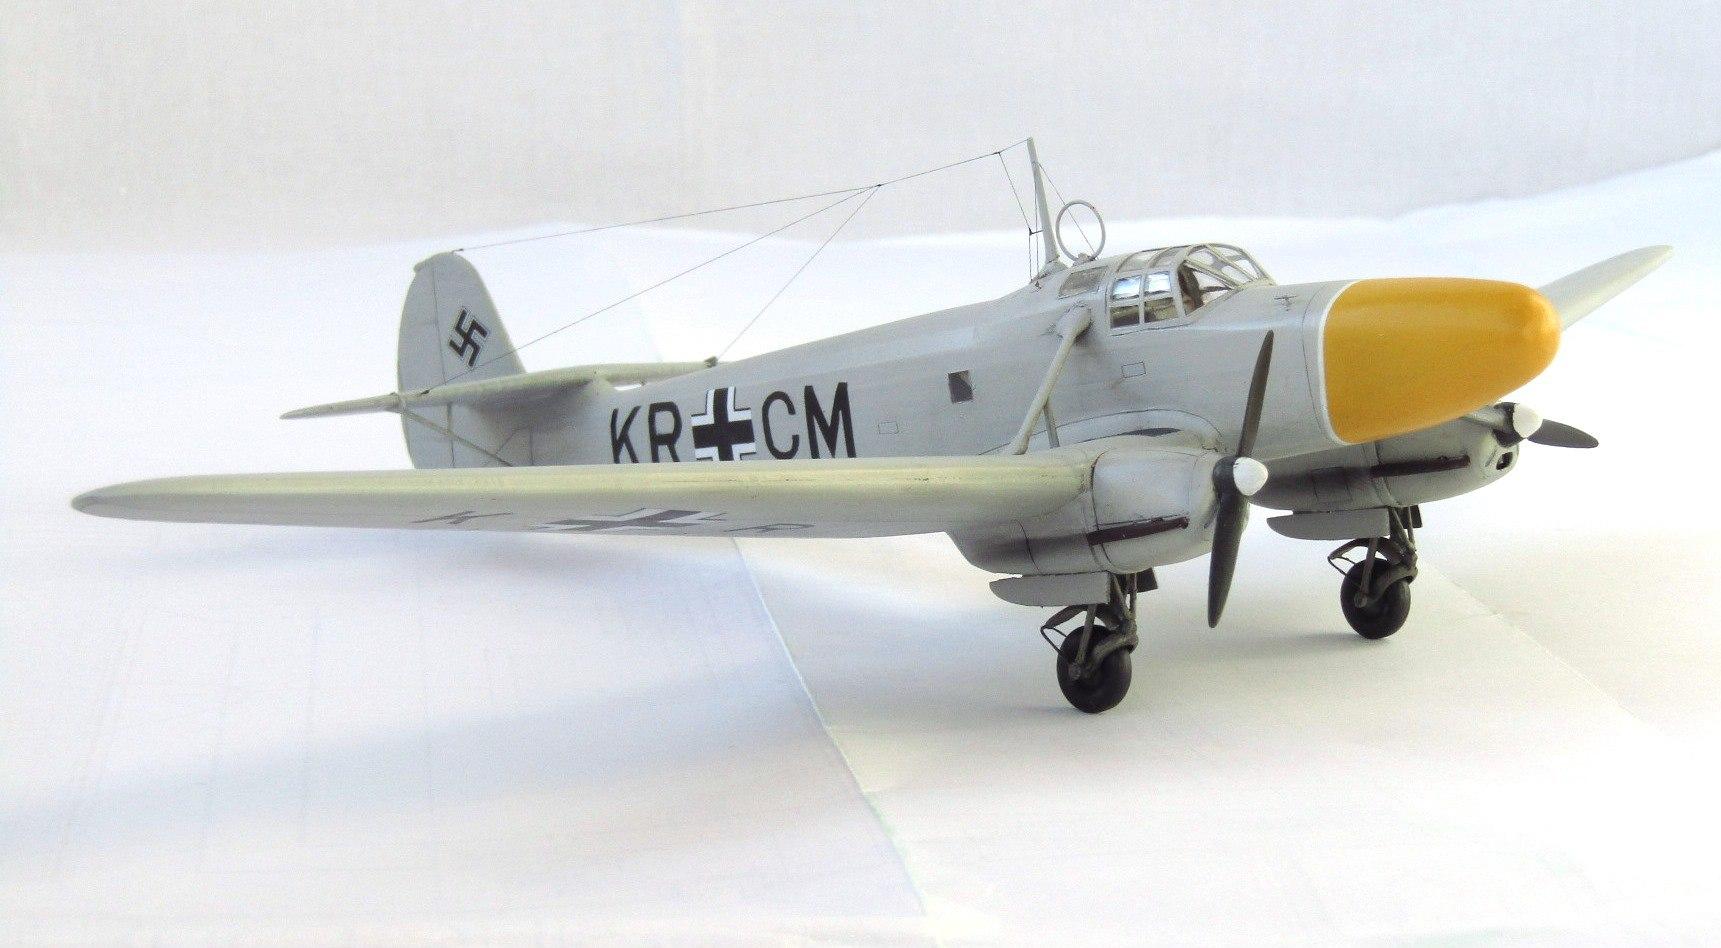 FW - 58C weihe 1/72 (Special Hobby) D-9zWh7mc5U